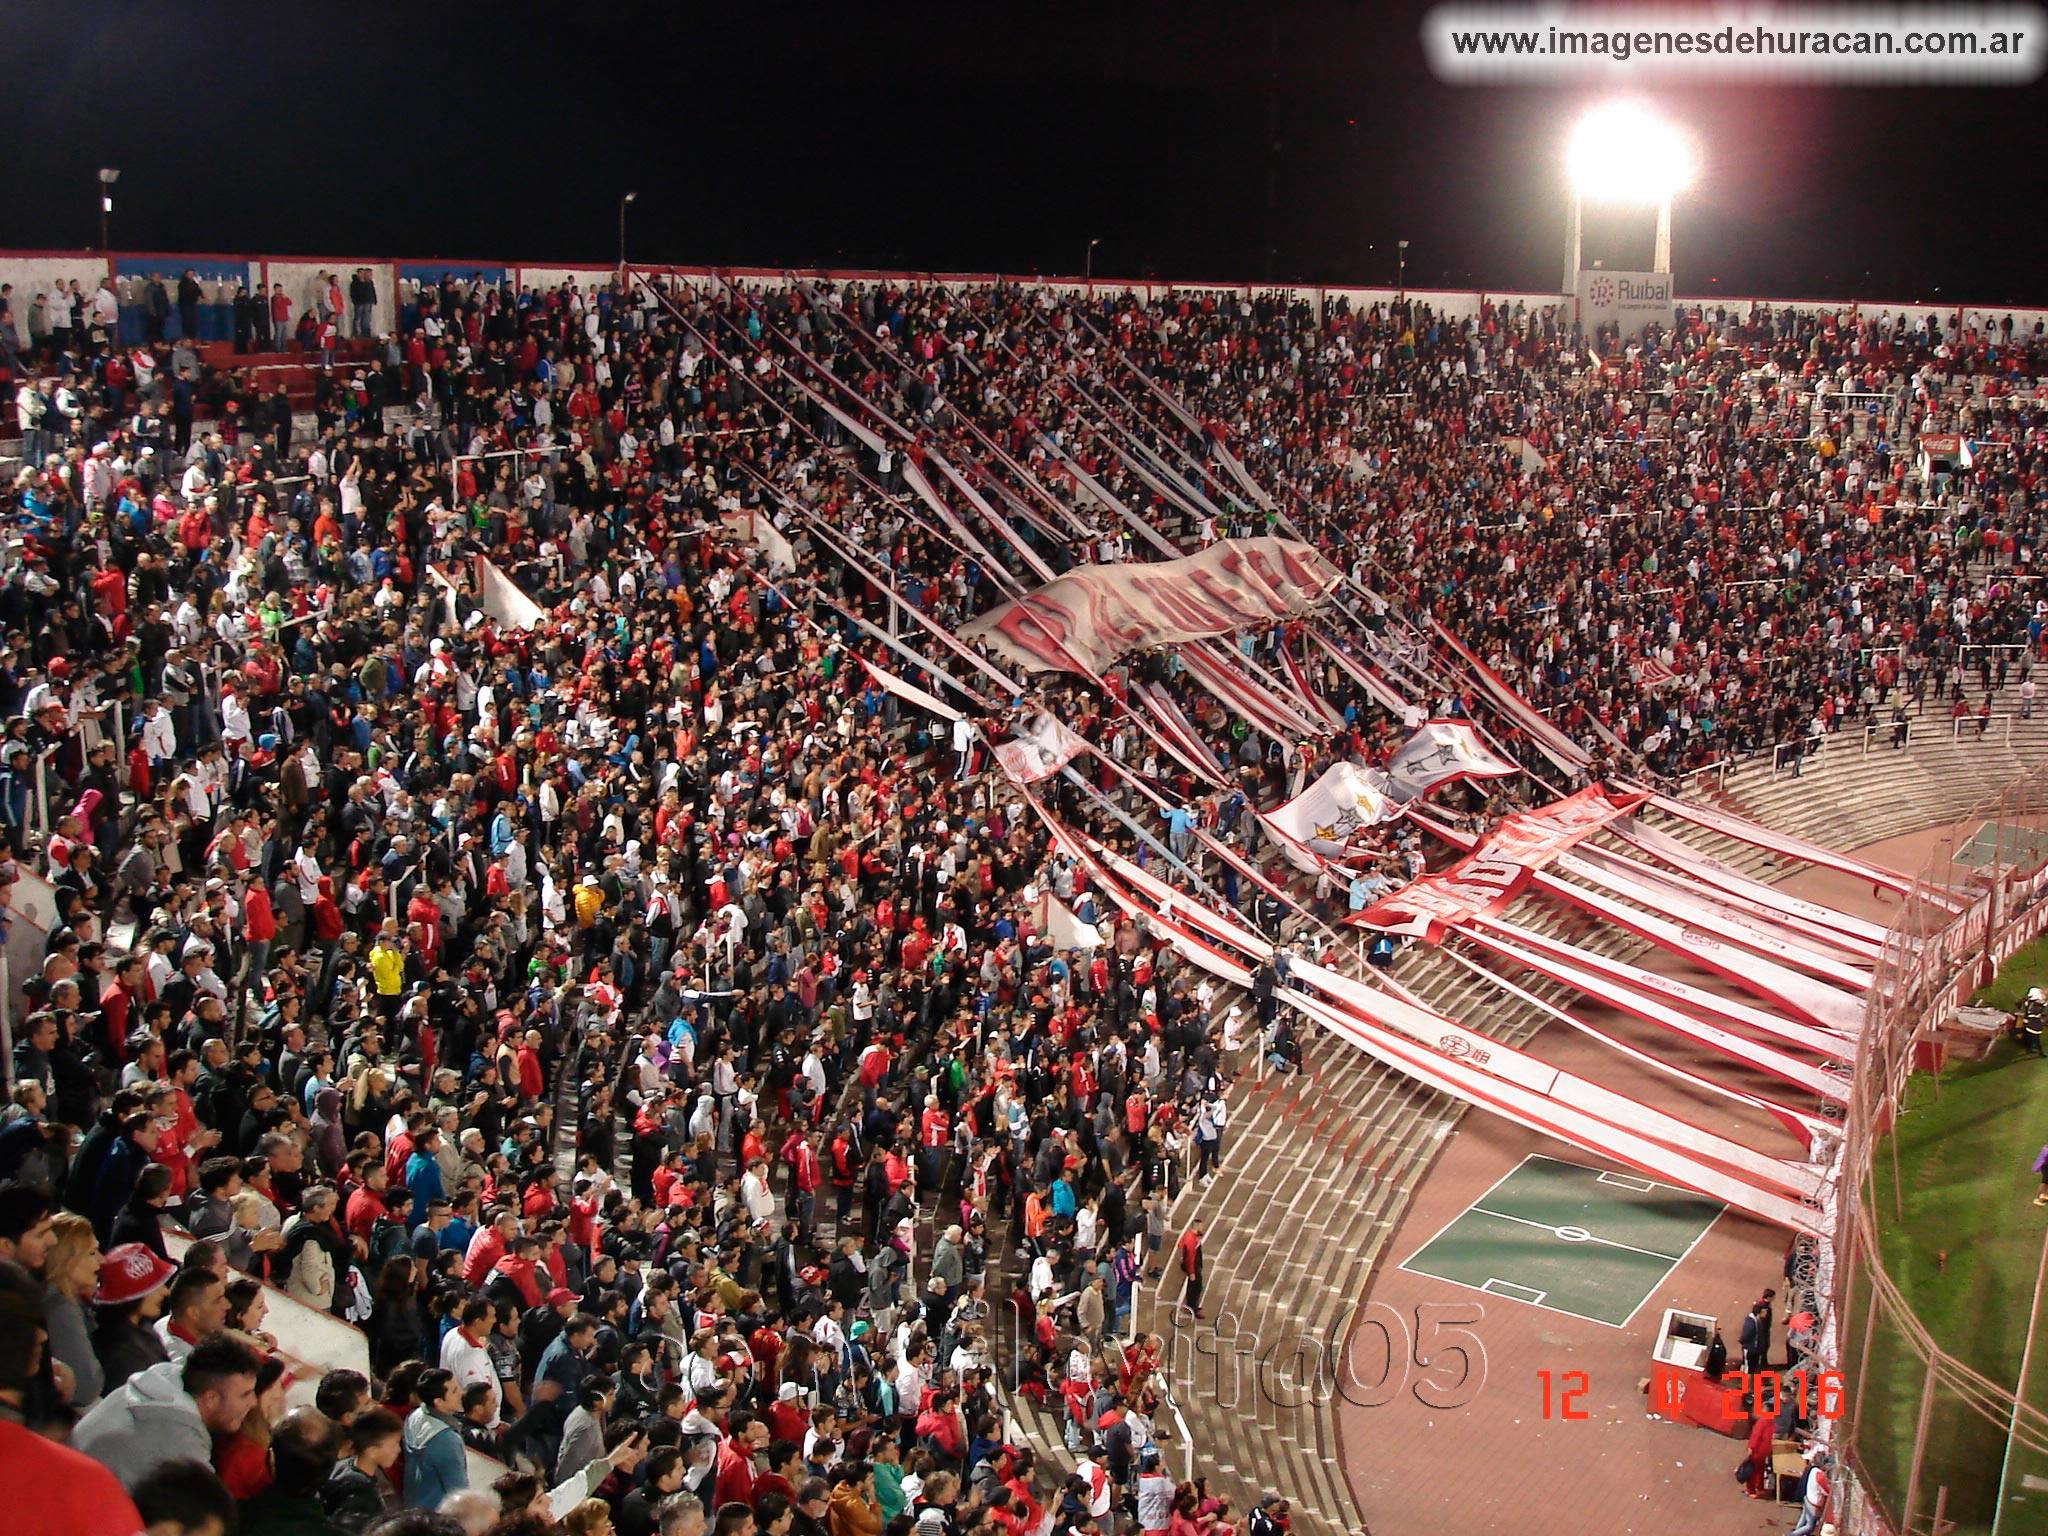 Huracán vs peñarol copa libertadores 2016